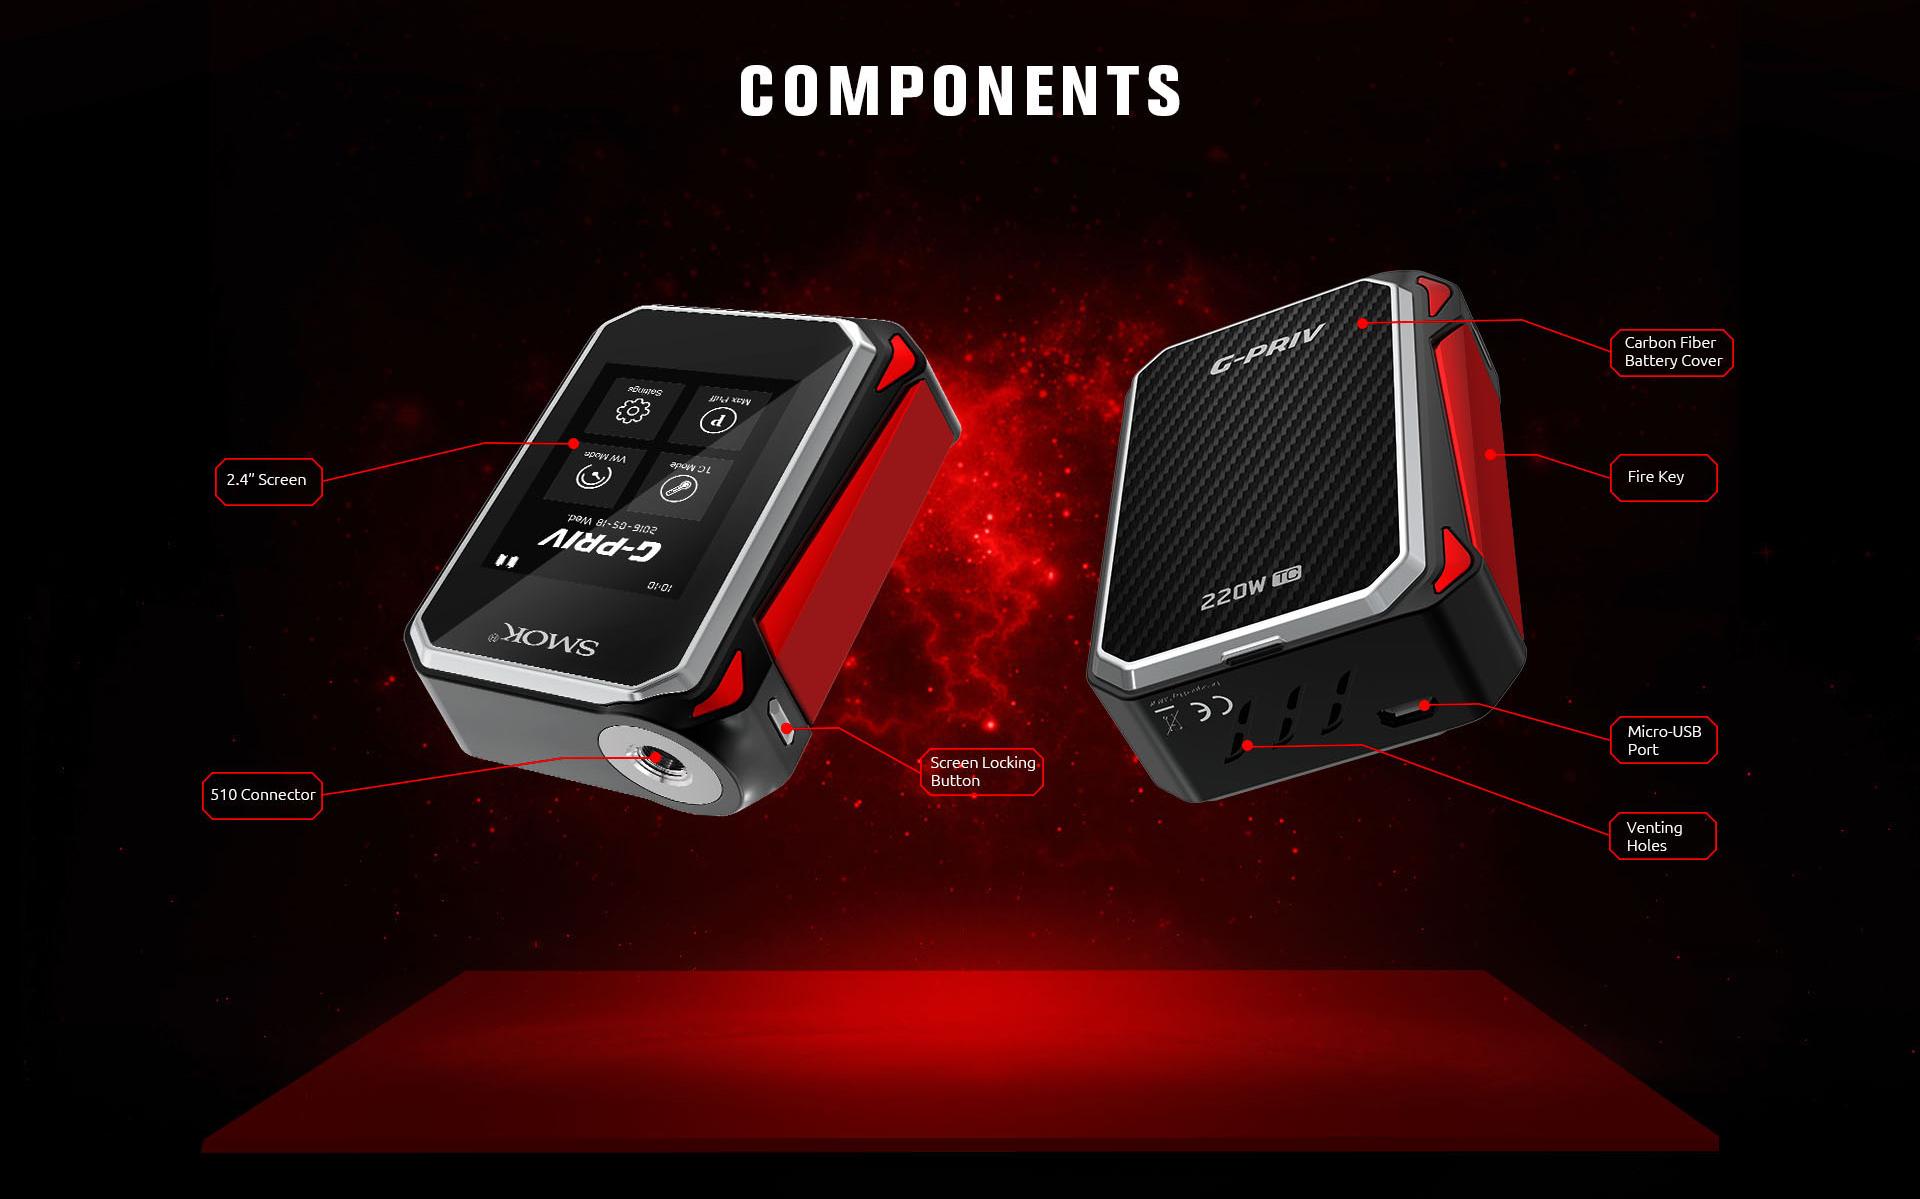 smok-g-priv-220-box-mod-components